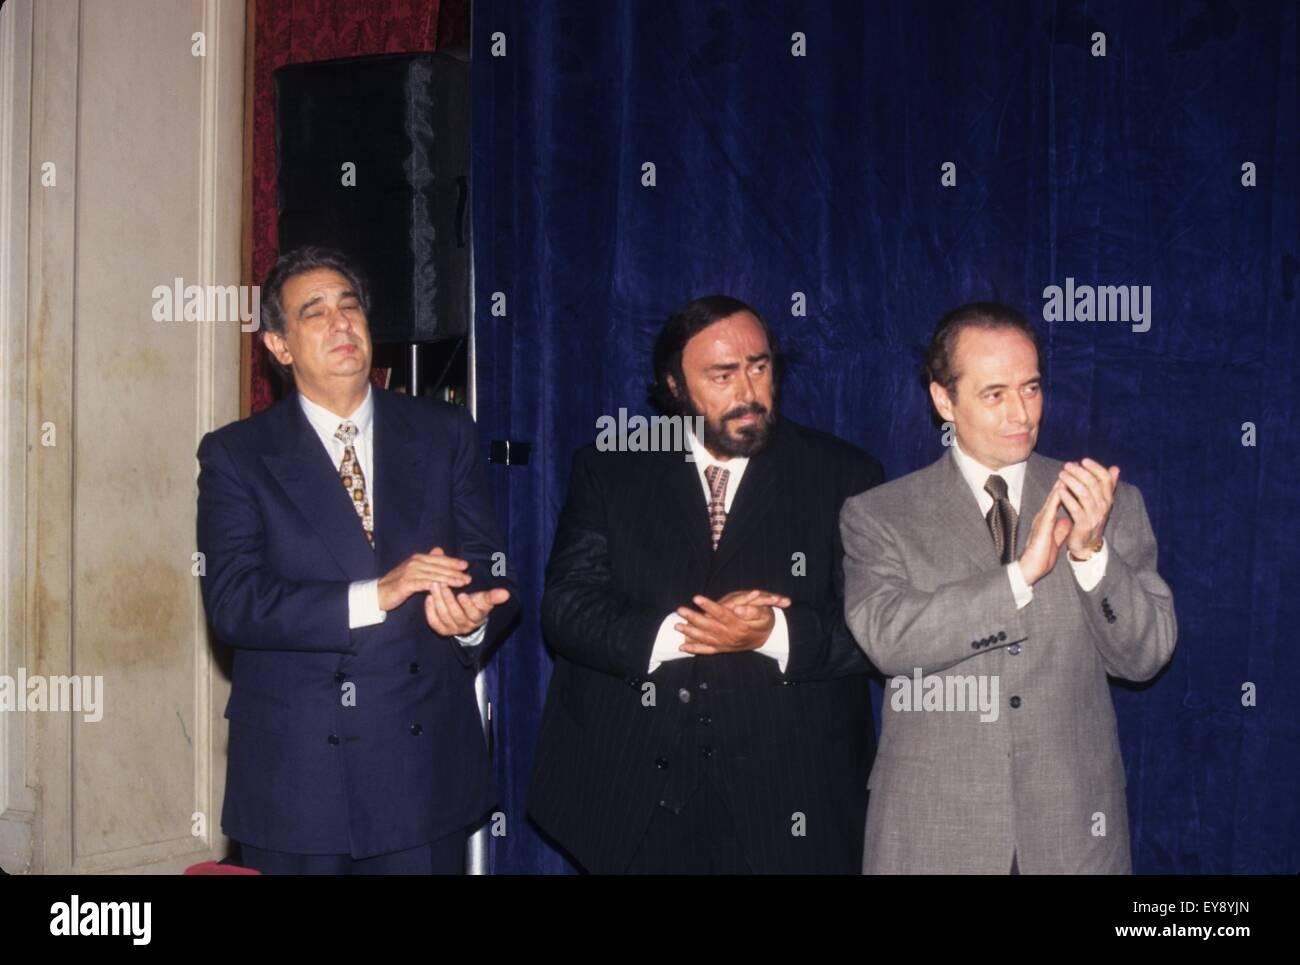 LUCIANO PAVAROTTI with Jose Carreras and Placido Domingo.The 3 ...